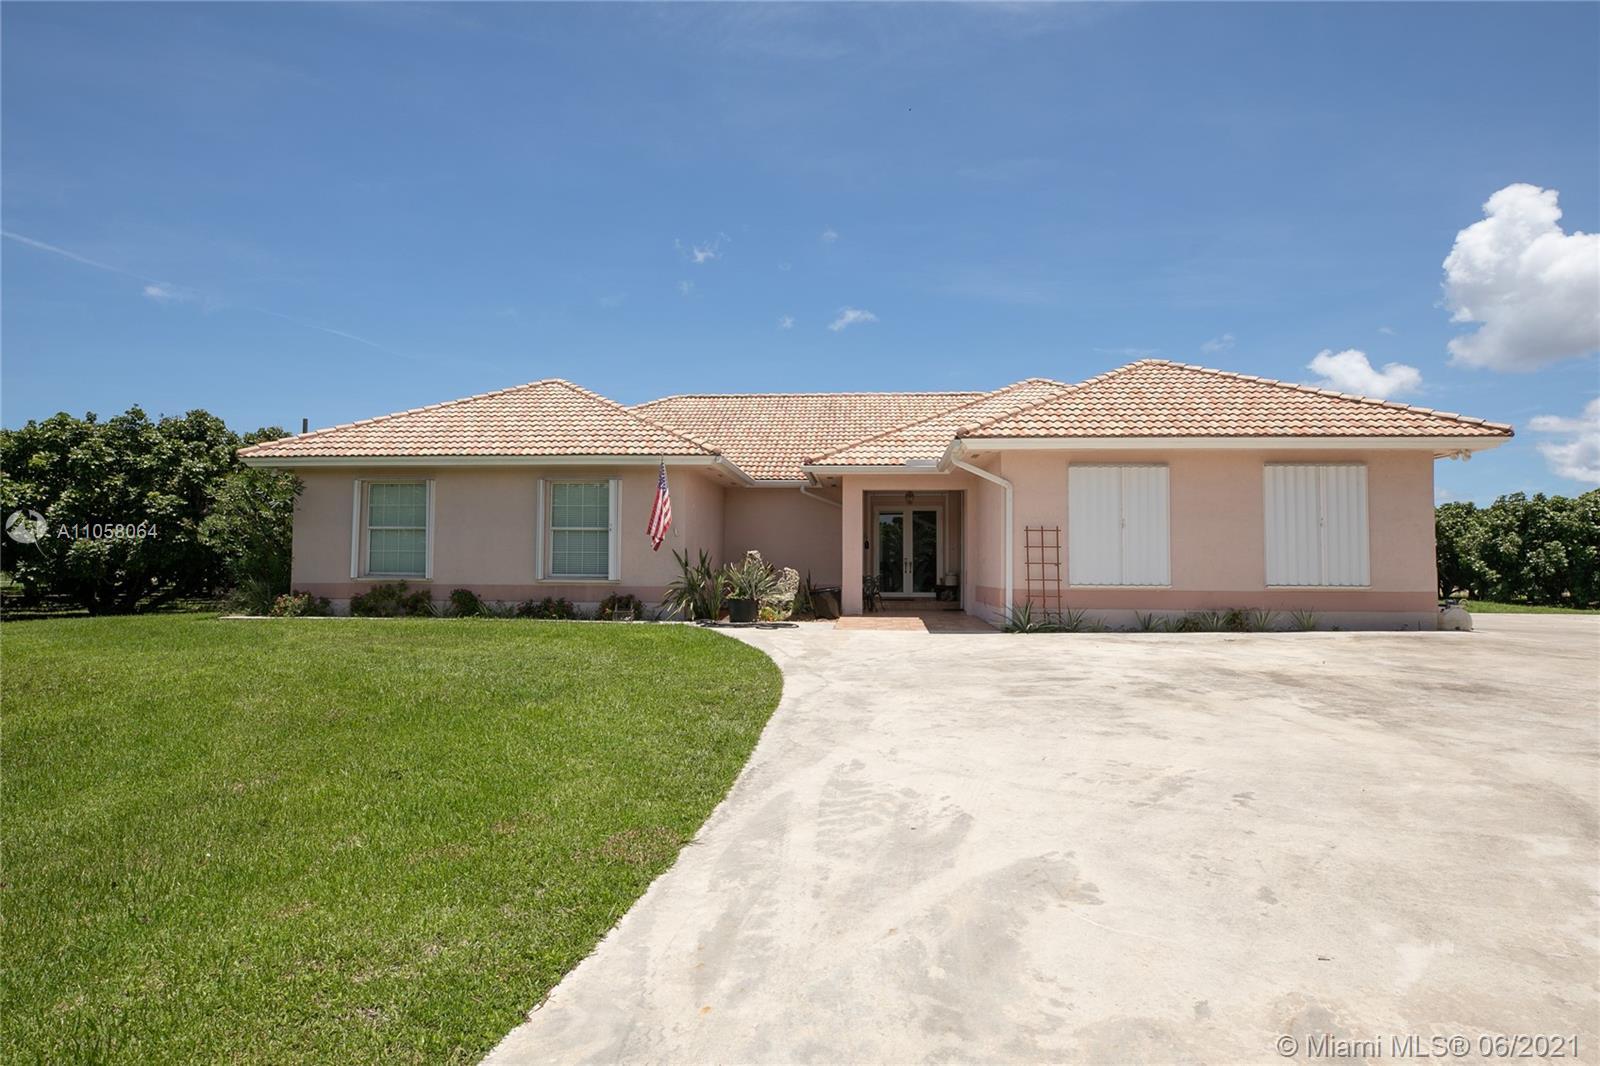 21050 Sw 368th St Property Photo 1